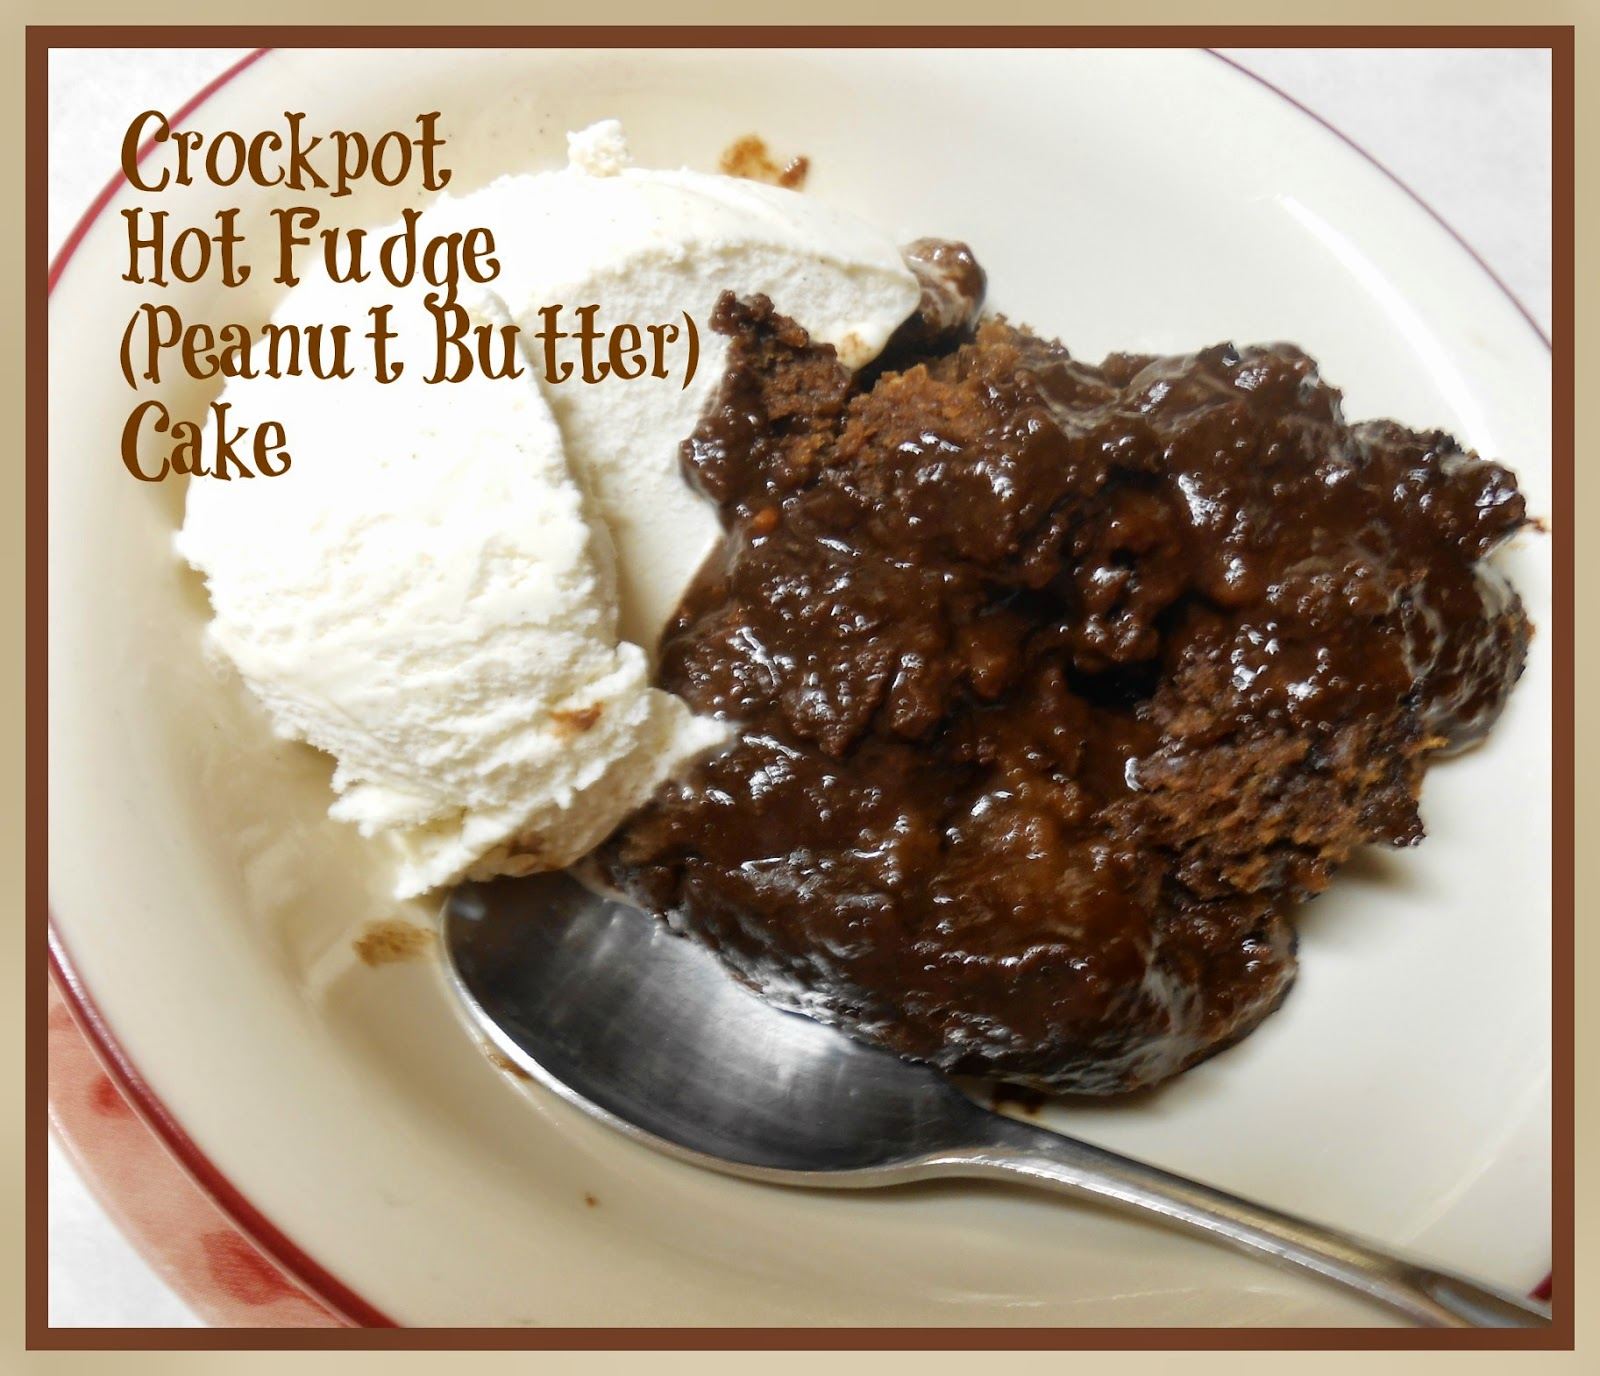 Crockpot Hot Fudge Peanut Butter